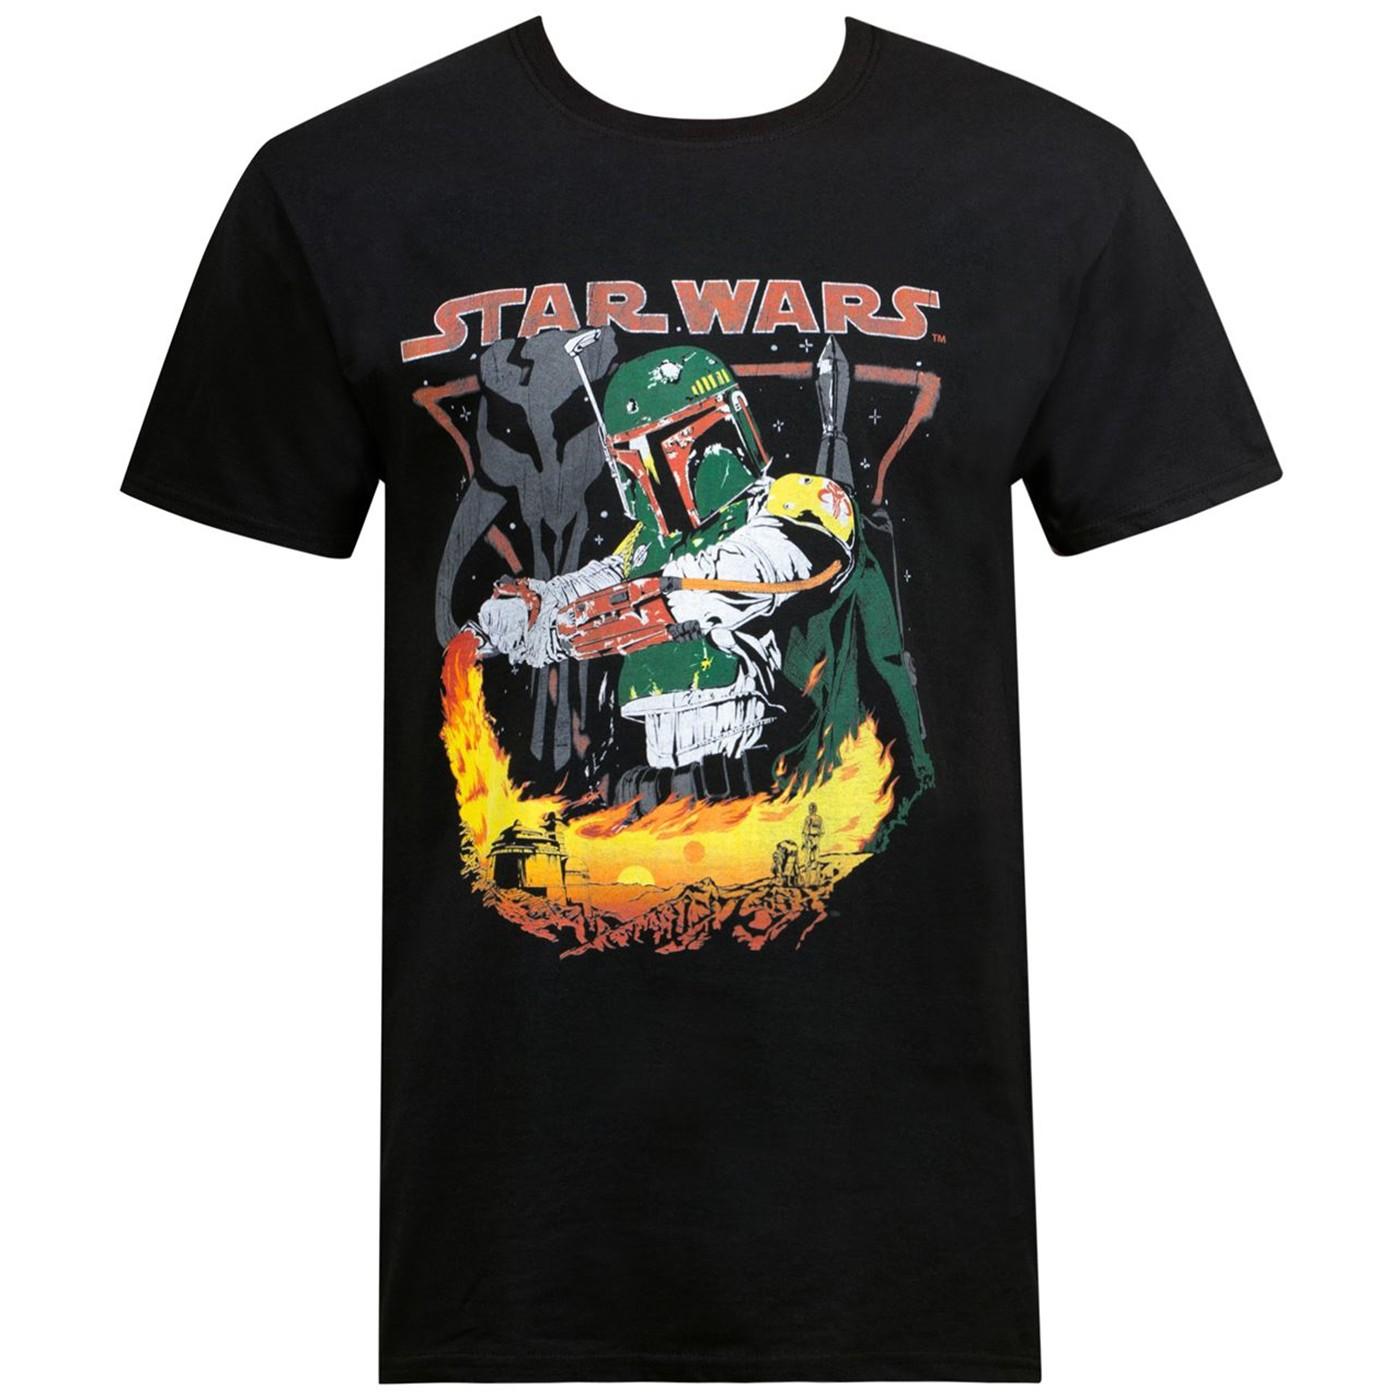 Star Wars Boba Fett Tatooine Men's T-Shirt